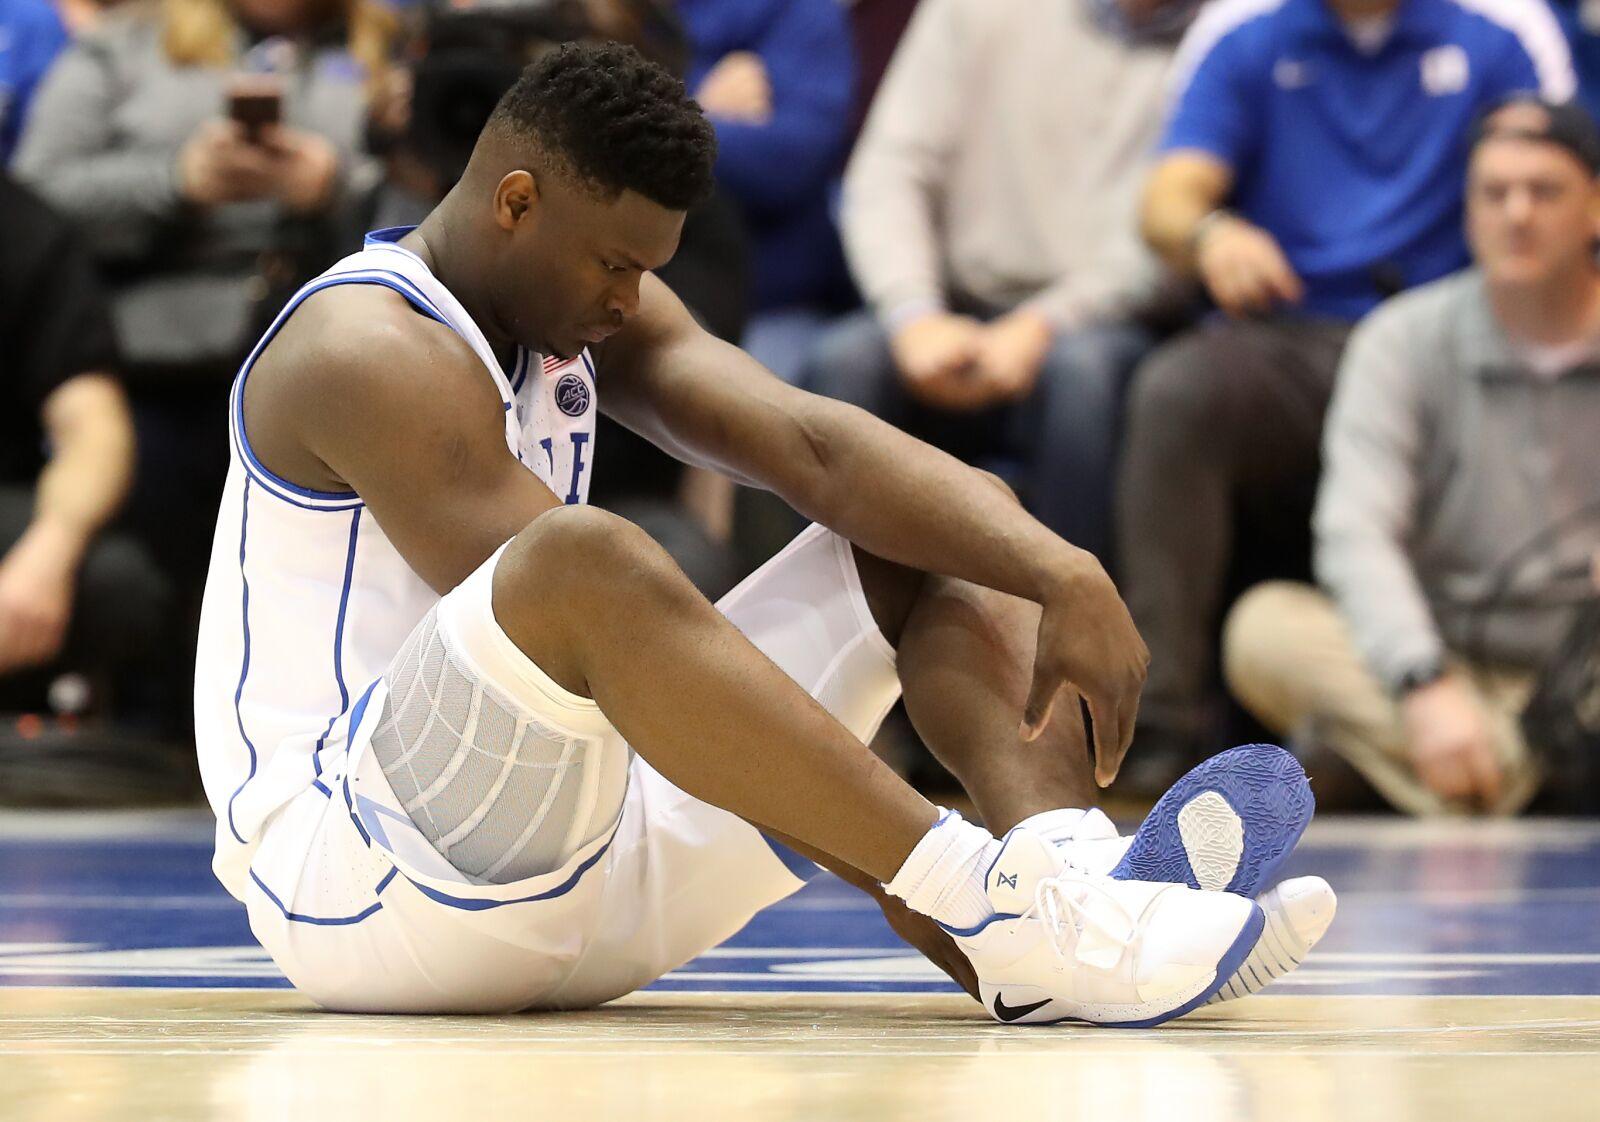 DeMarcus Cousins slams NCAA in wake of Zion Williamson injury